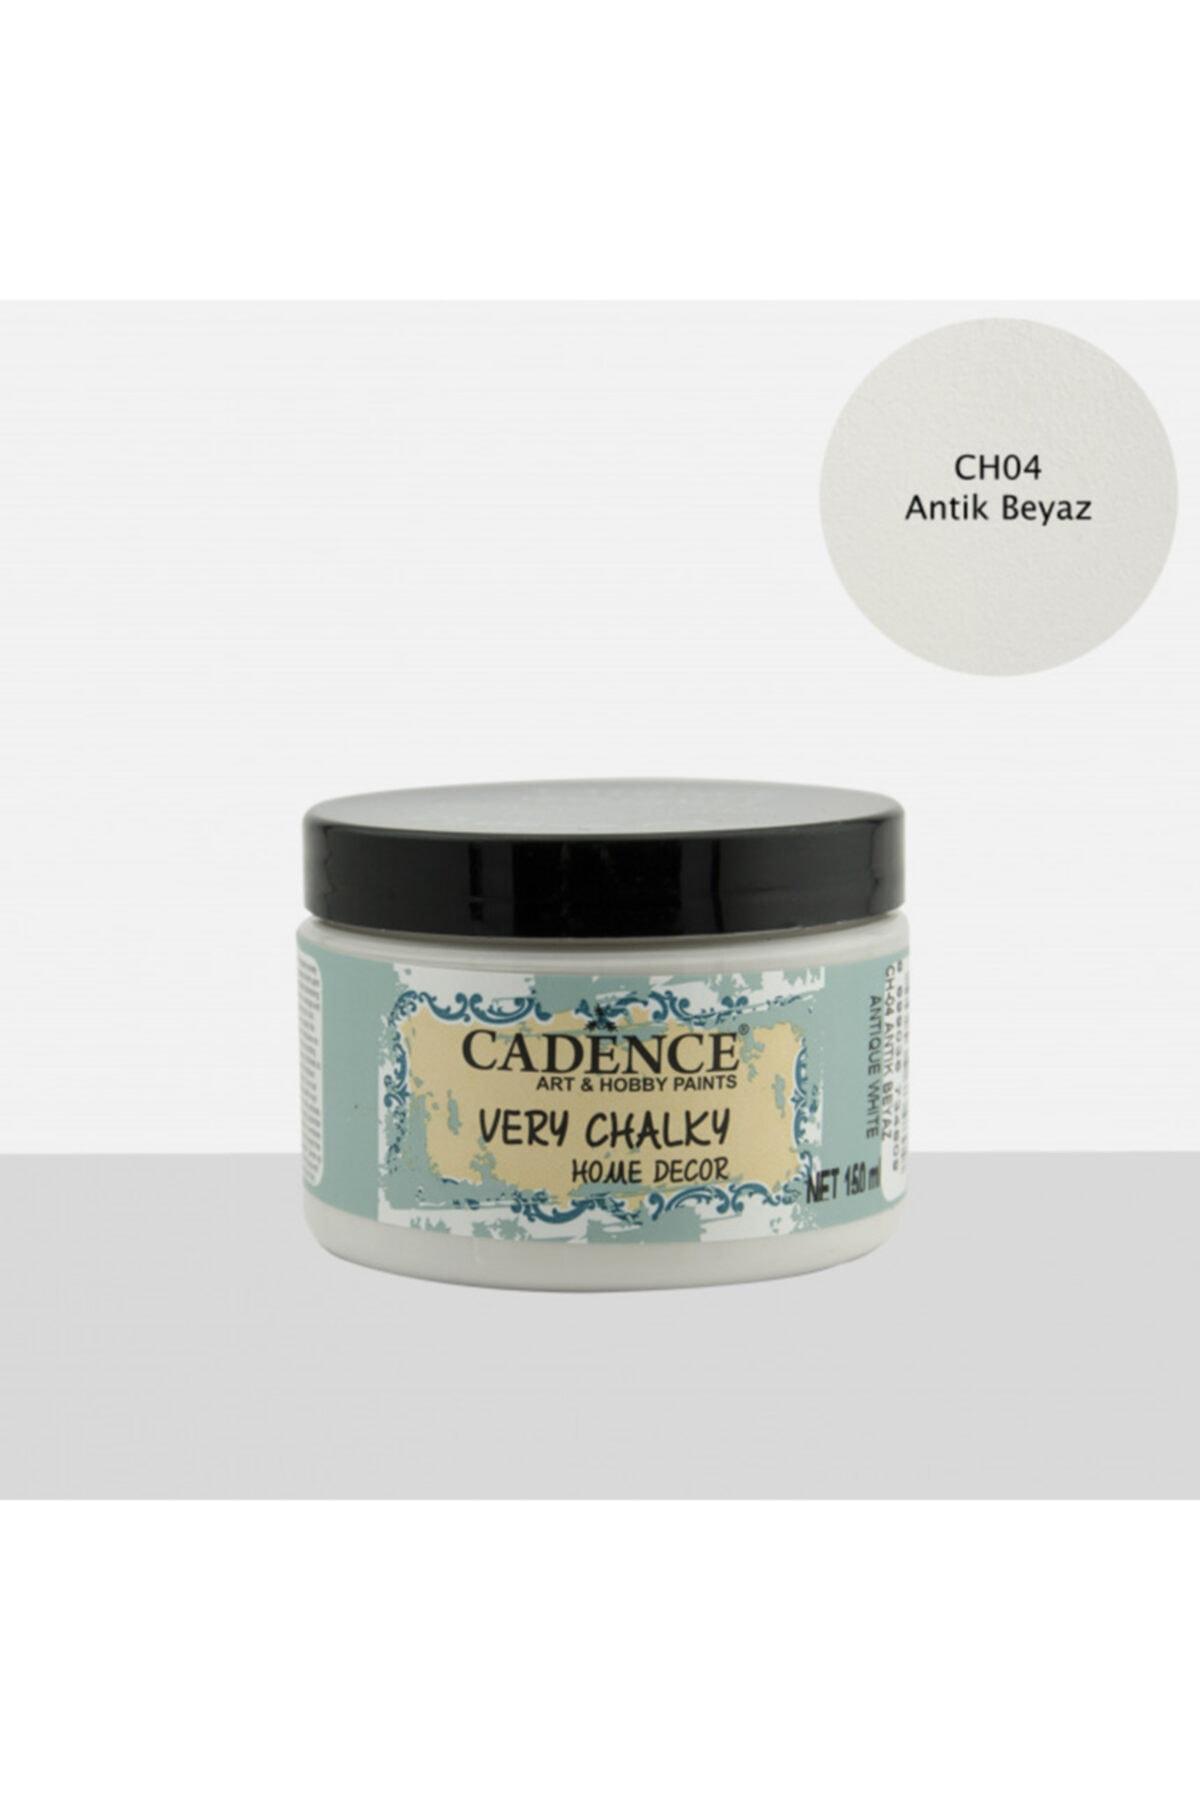 Cadence Very Chalky Home Decor 150 Ml Ch04 Antik Beyaz 1